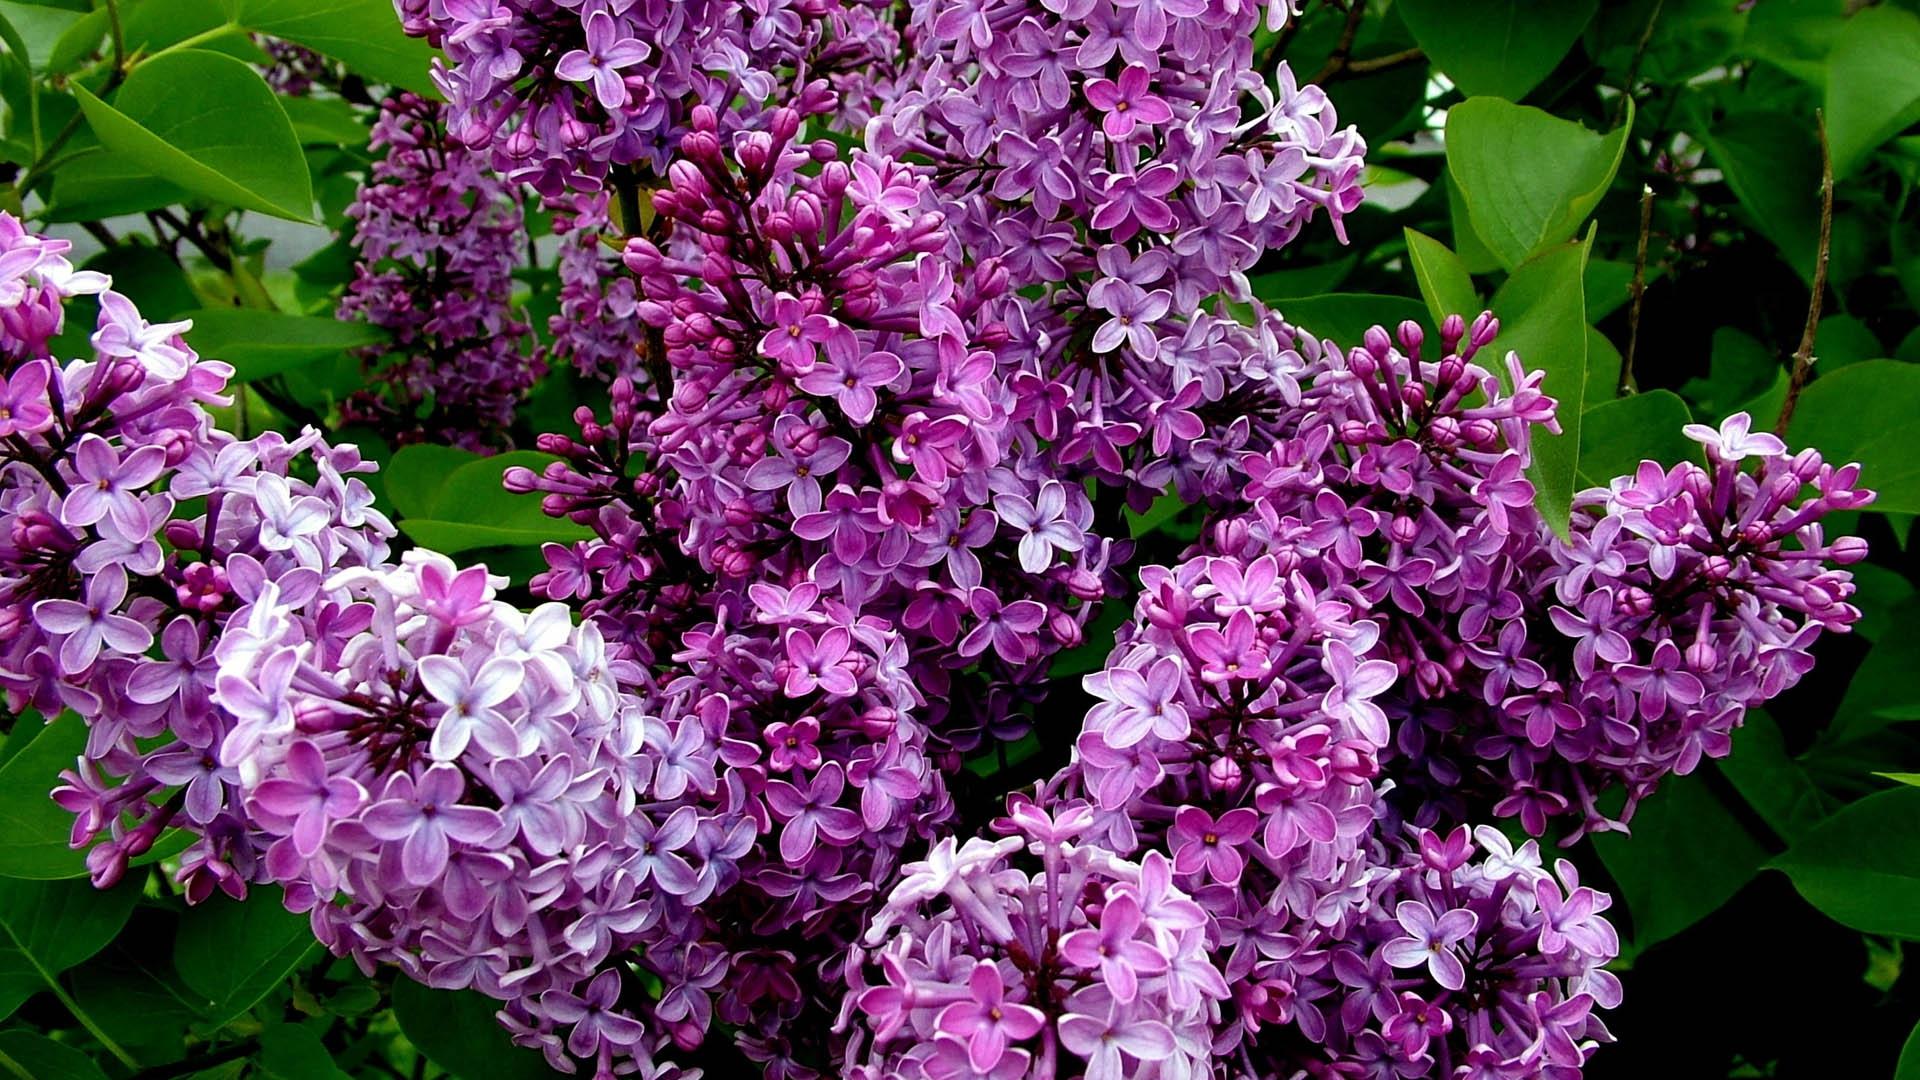 hintergrundbilder blumen blumenbl tter bl hen kraut lila blume flora botanik. Black Bedroom Furniture Sets. Home Design Ideas